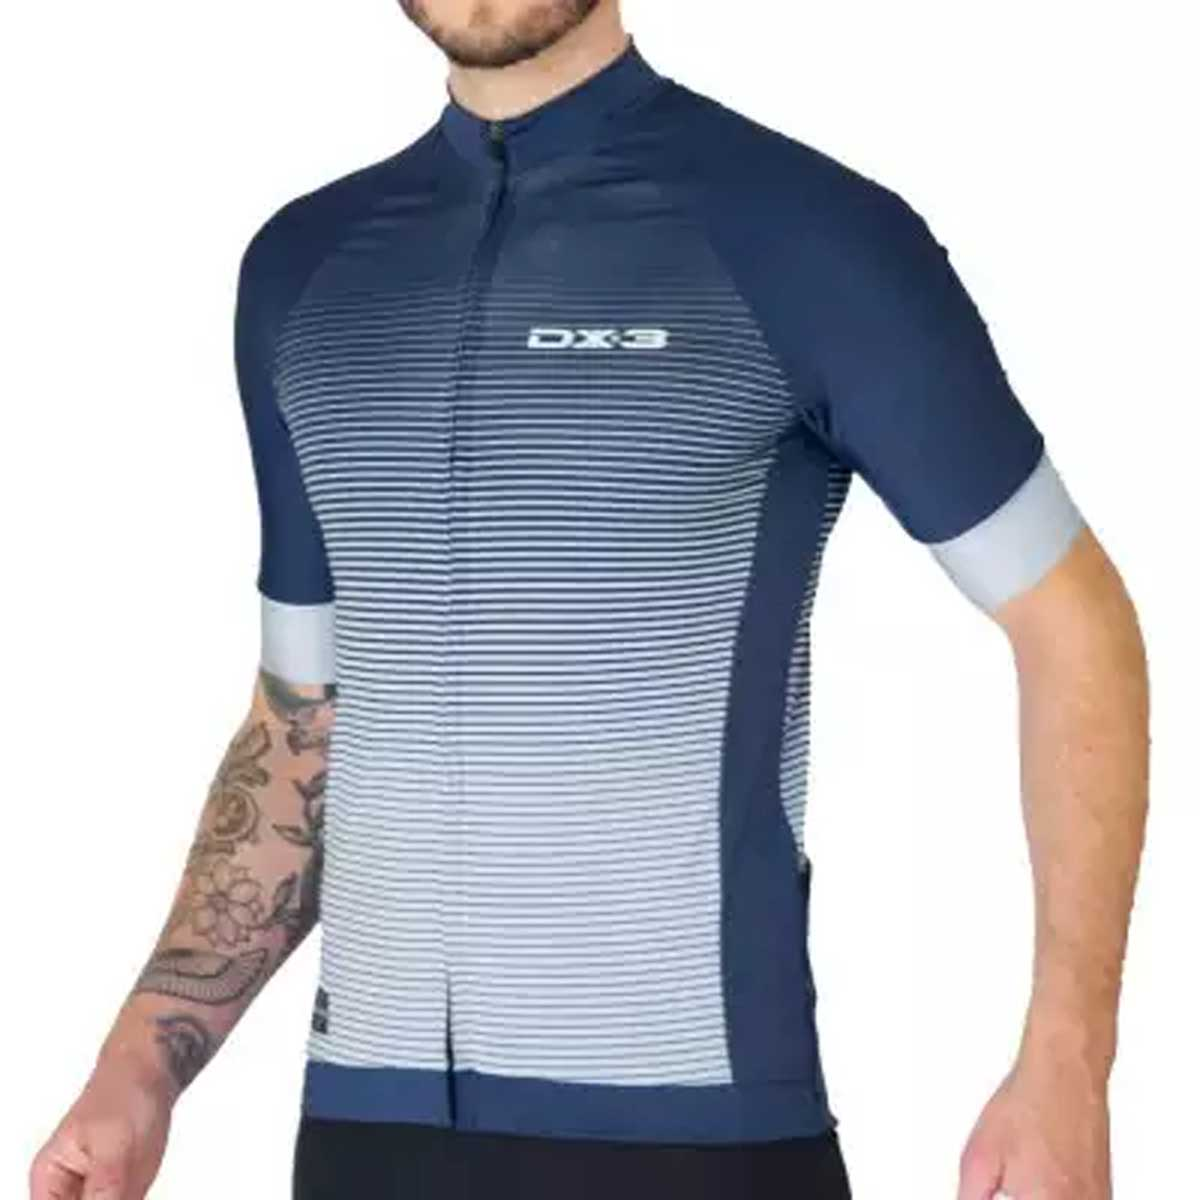 Camisa DX3 Masculina Fast 04 Azul e Cinza Ciclismo 21